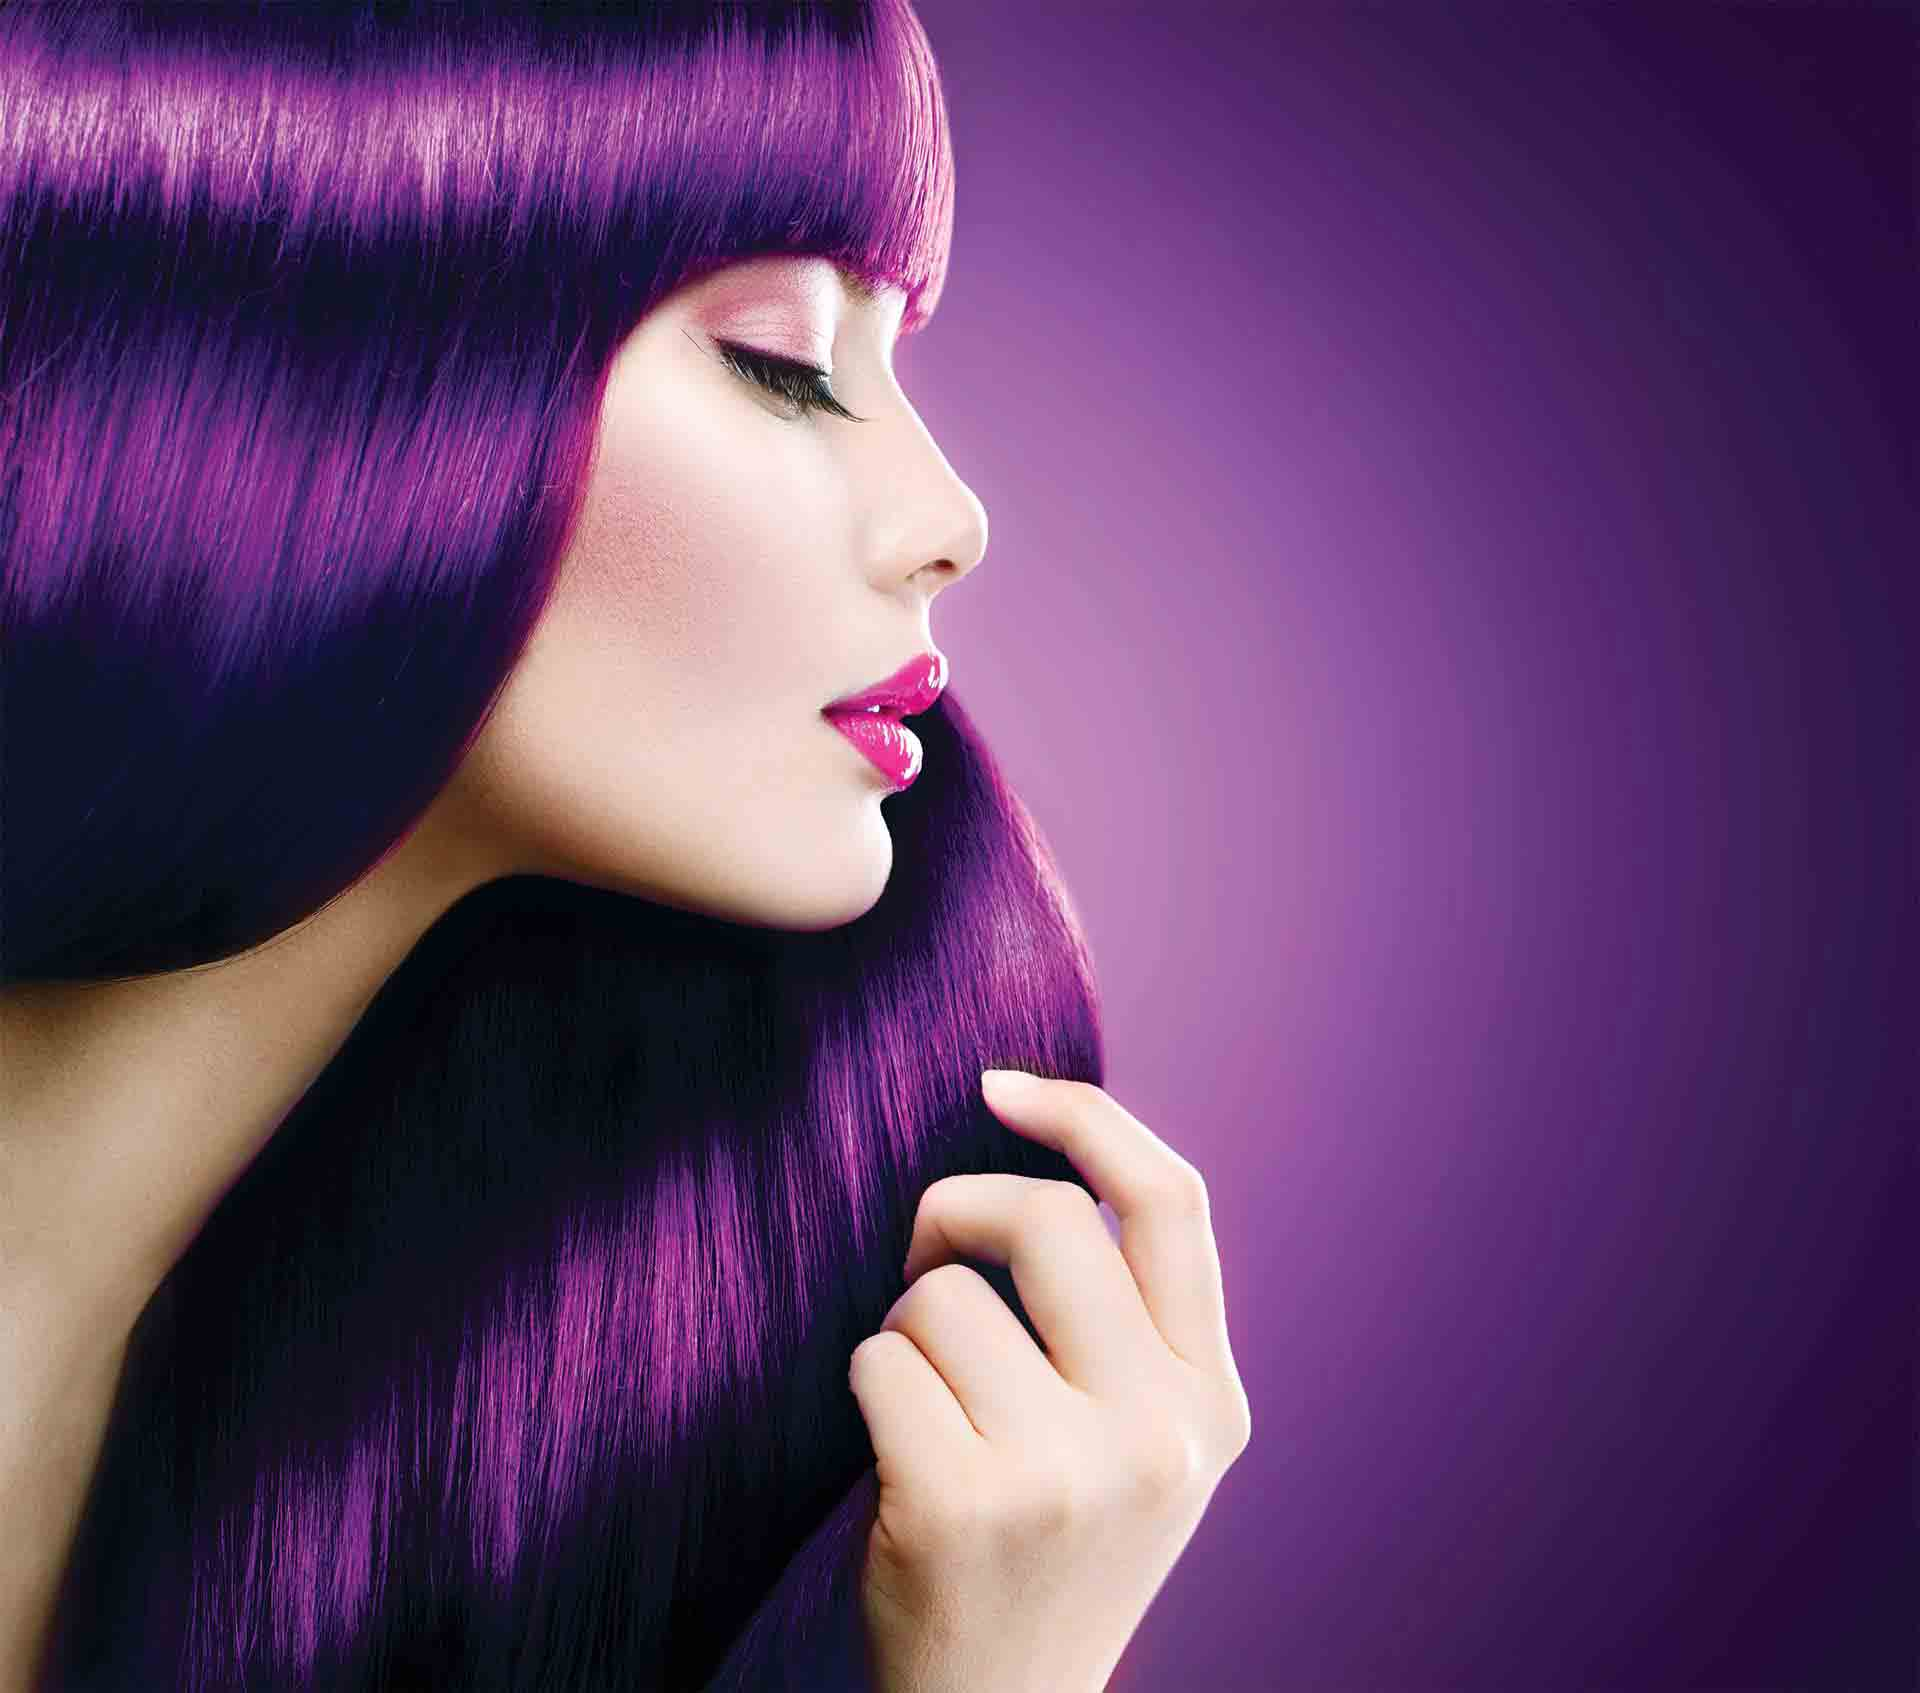 Fashion Nail Beauty Spa Elizabeth Nj: Hair Salon South Plainfield, NJ